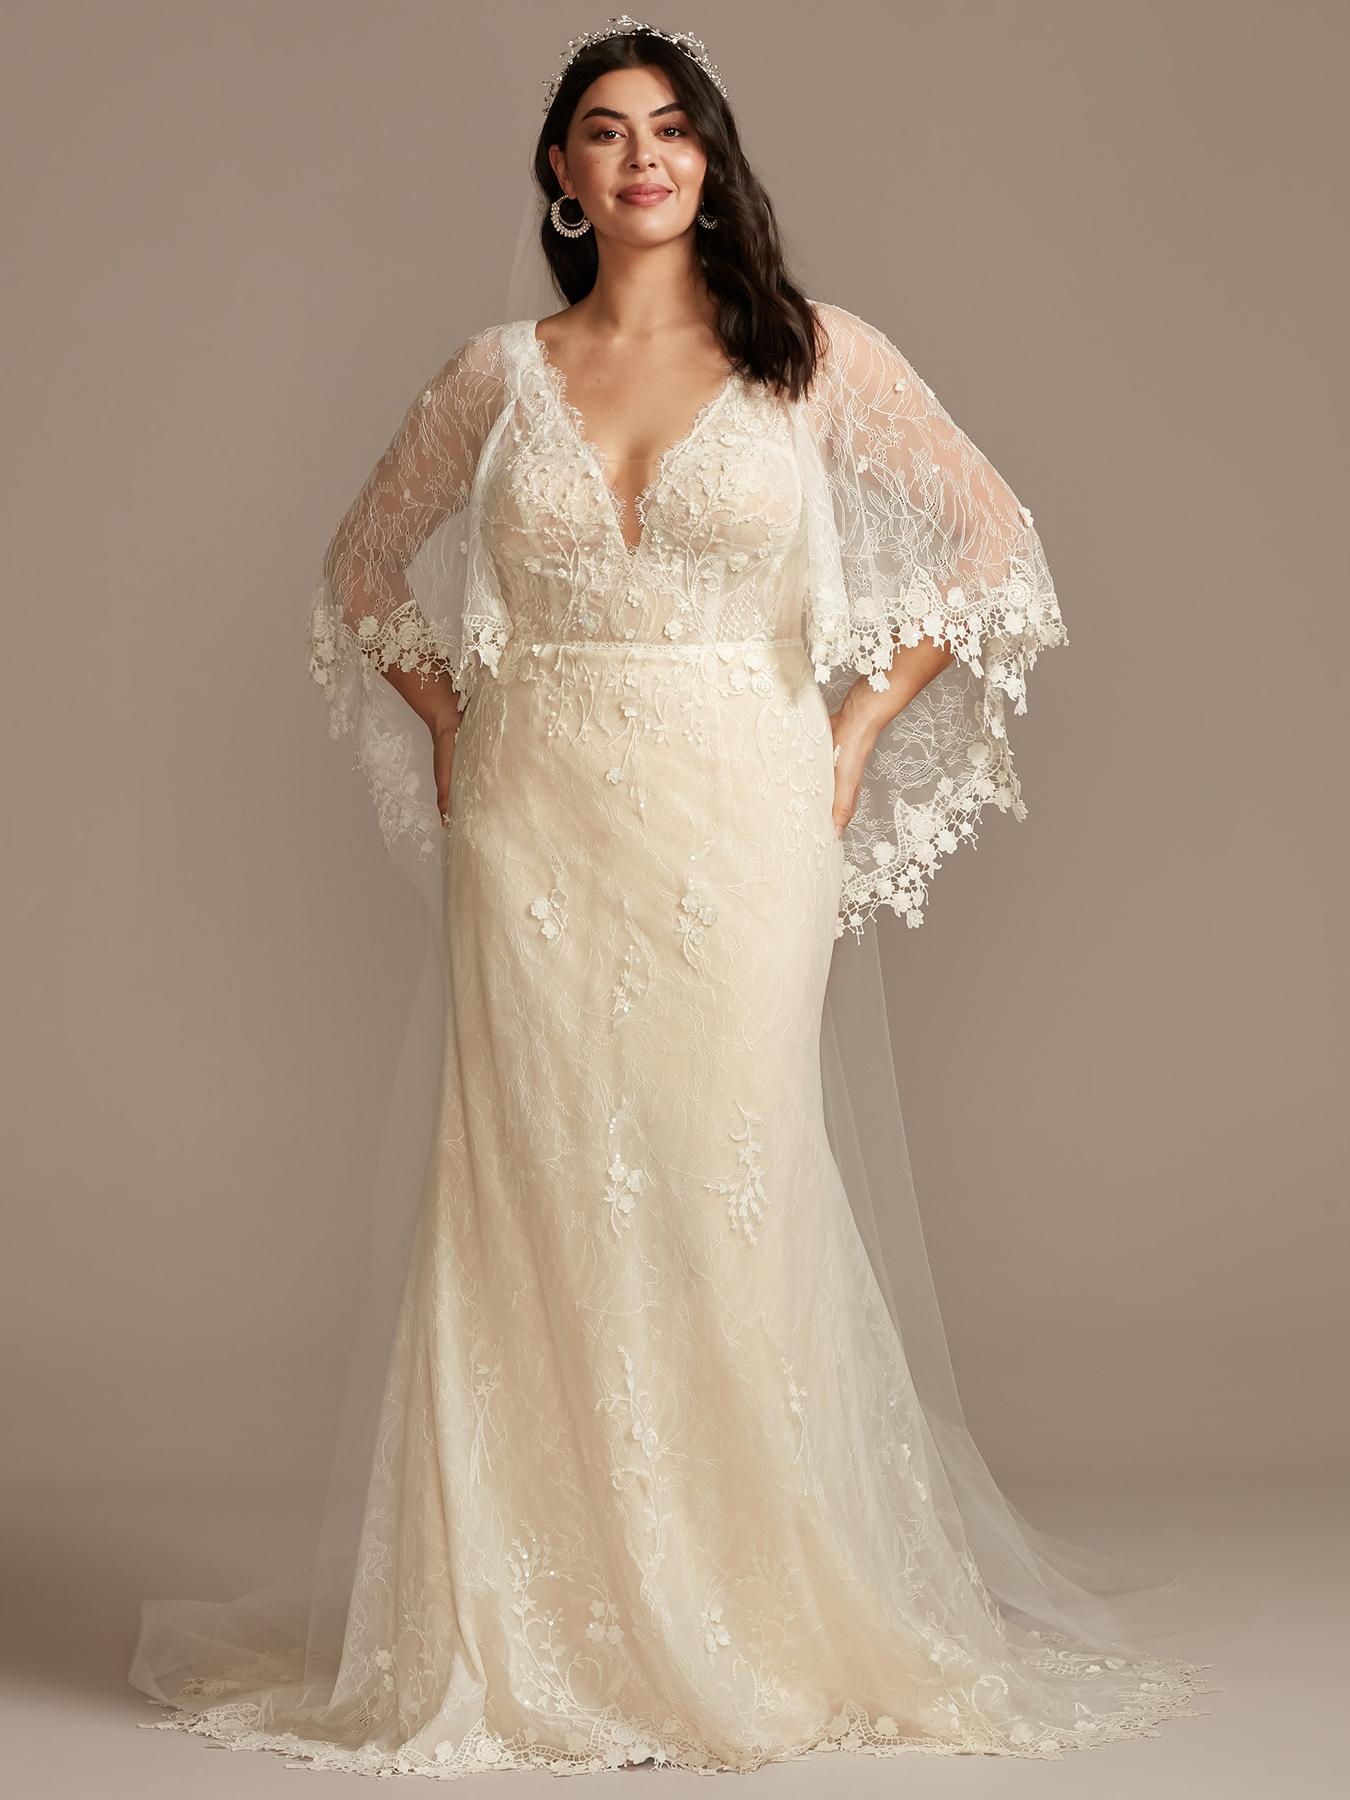 davids bridal cape sleeve deep v-neck wedding dress spring 2021